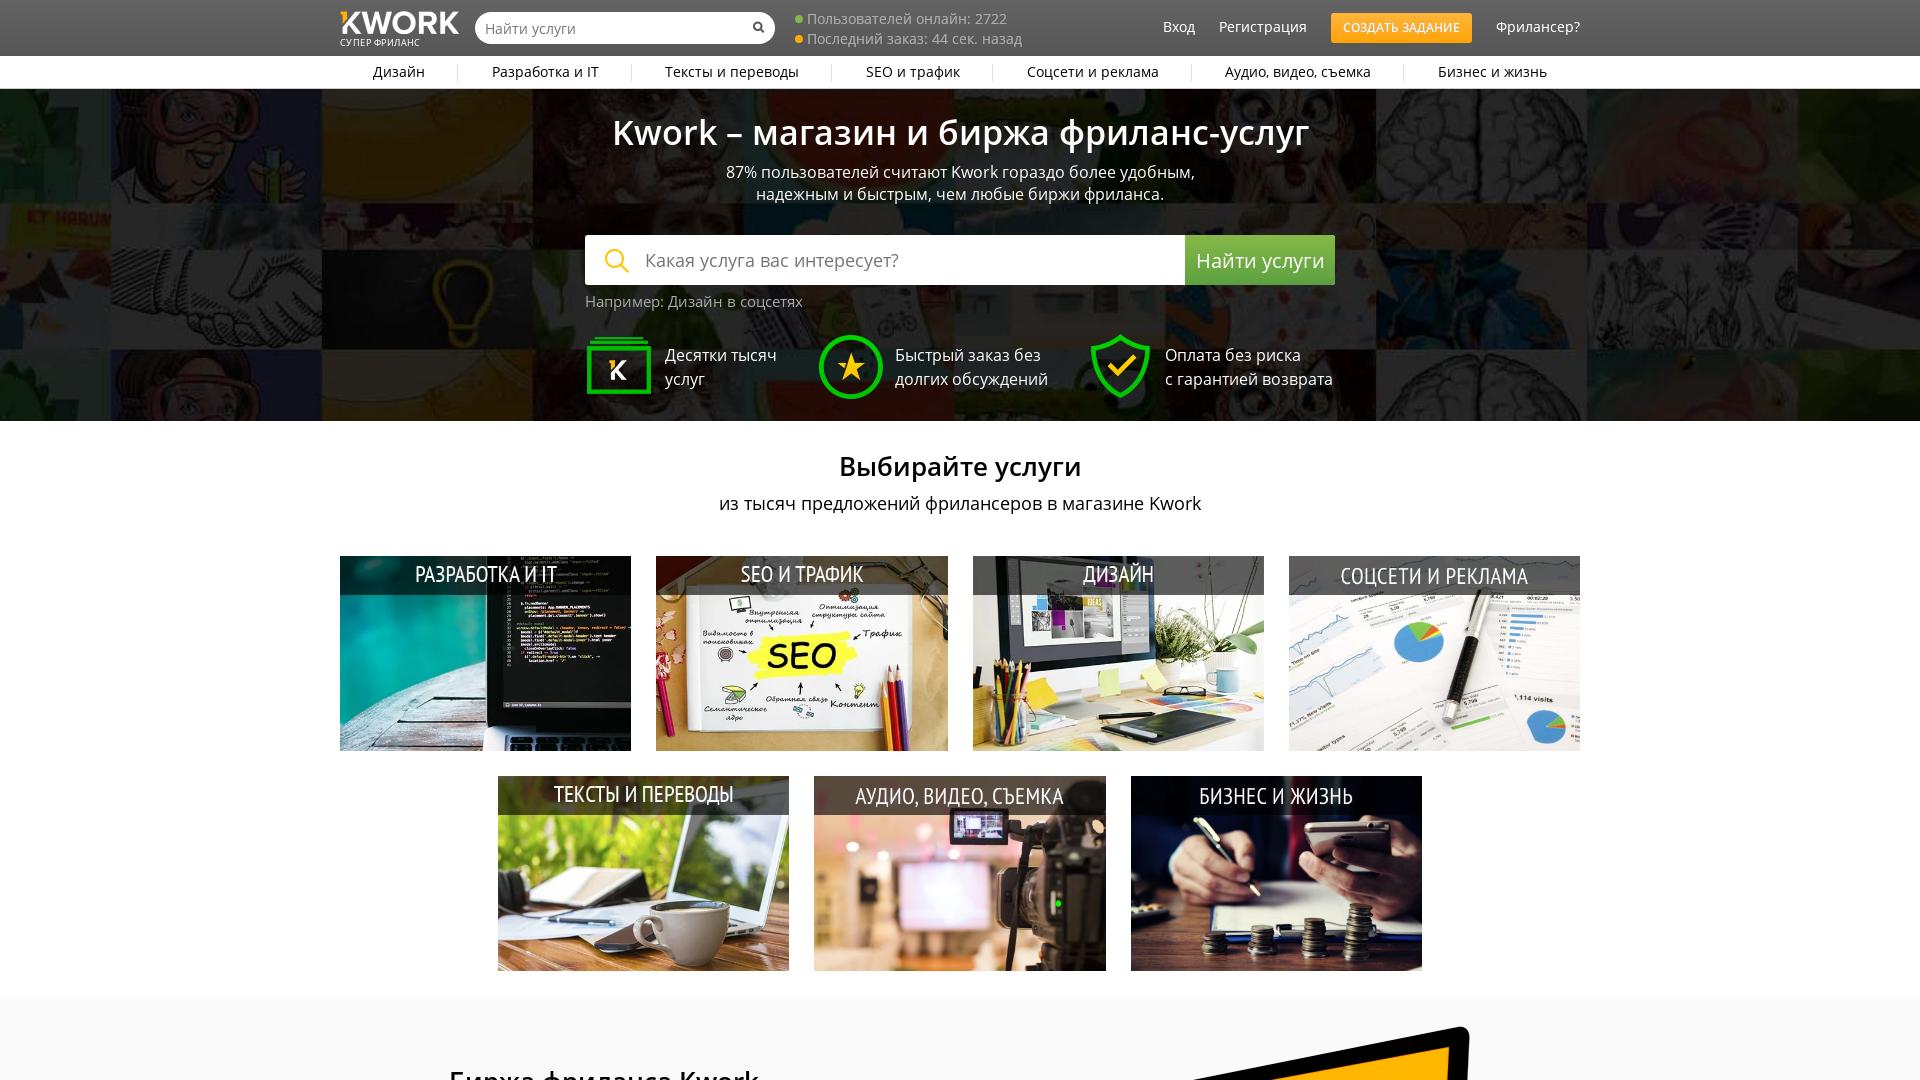 Kwork website